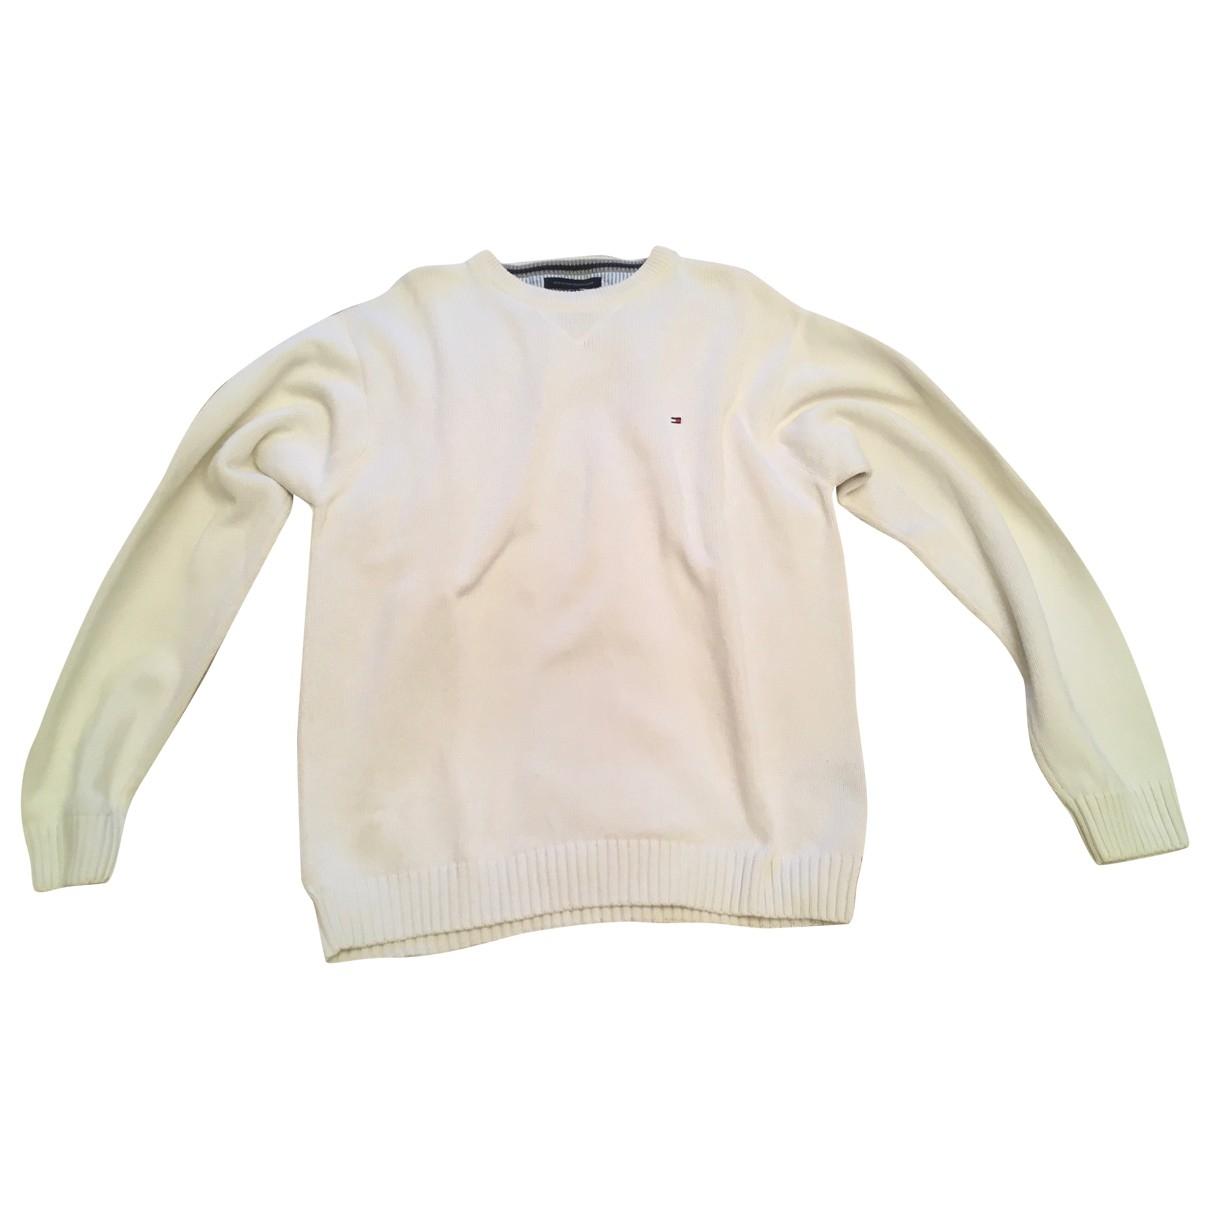 Tommy Hilfiger \N White Cotton Knitwear & Sweatshirts for Men XL International